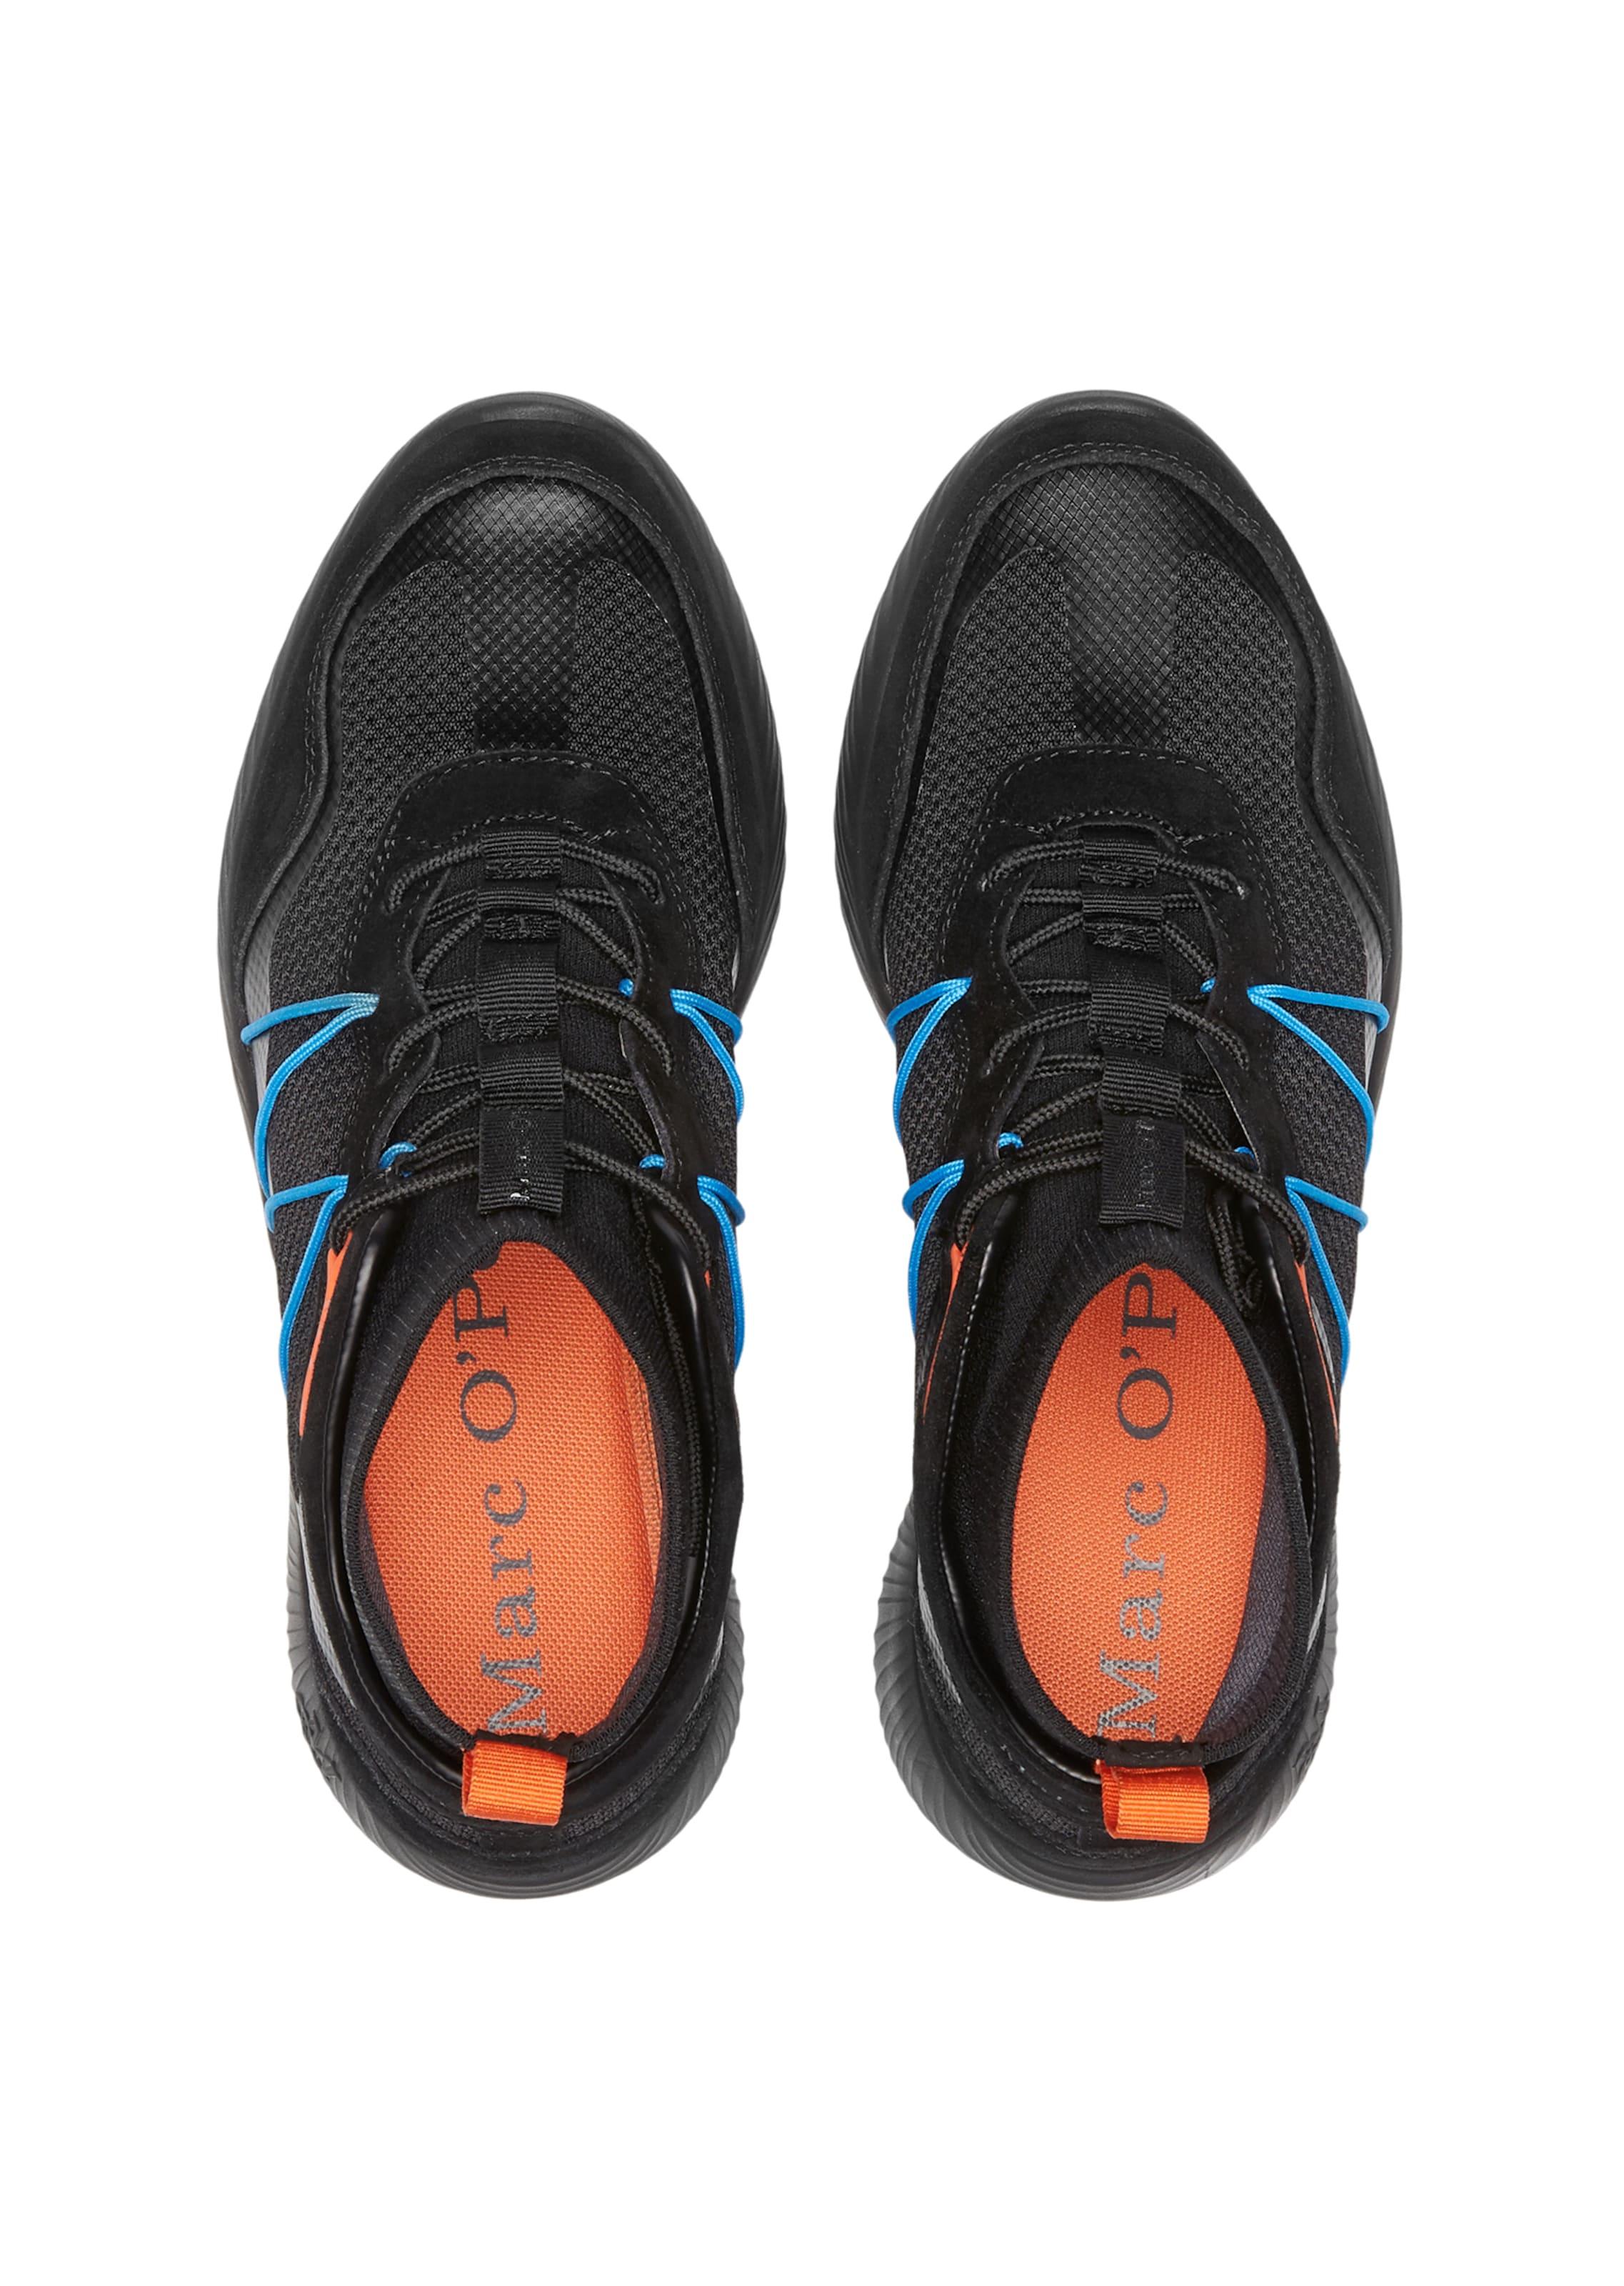 O'polo In Sneaker AquaKoralle Schwarz Marc qcS4Aj53RL